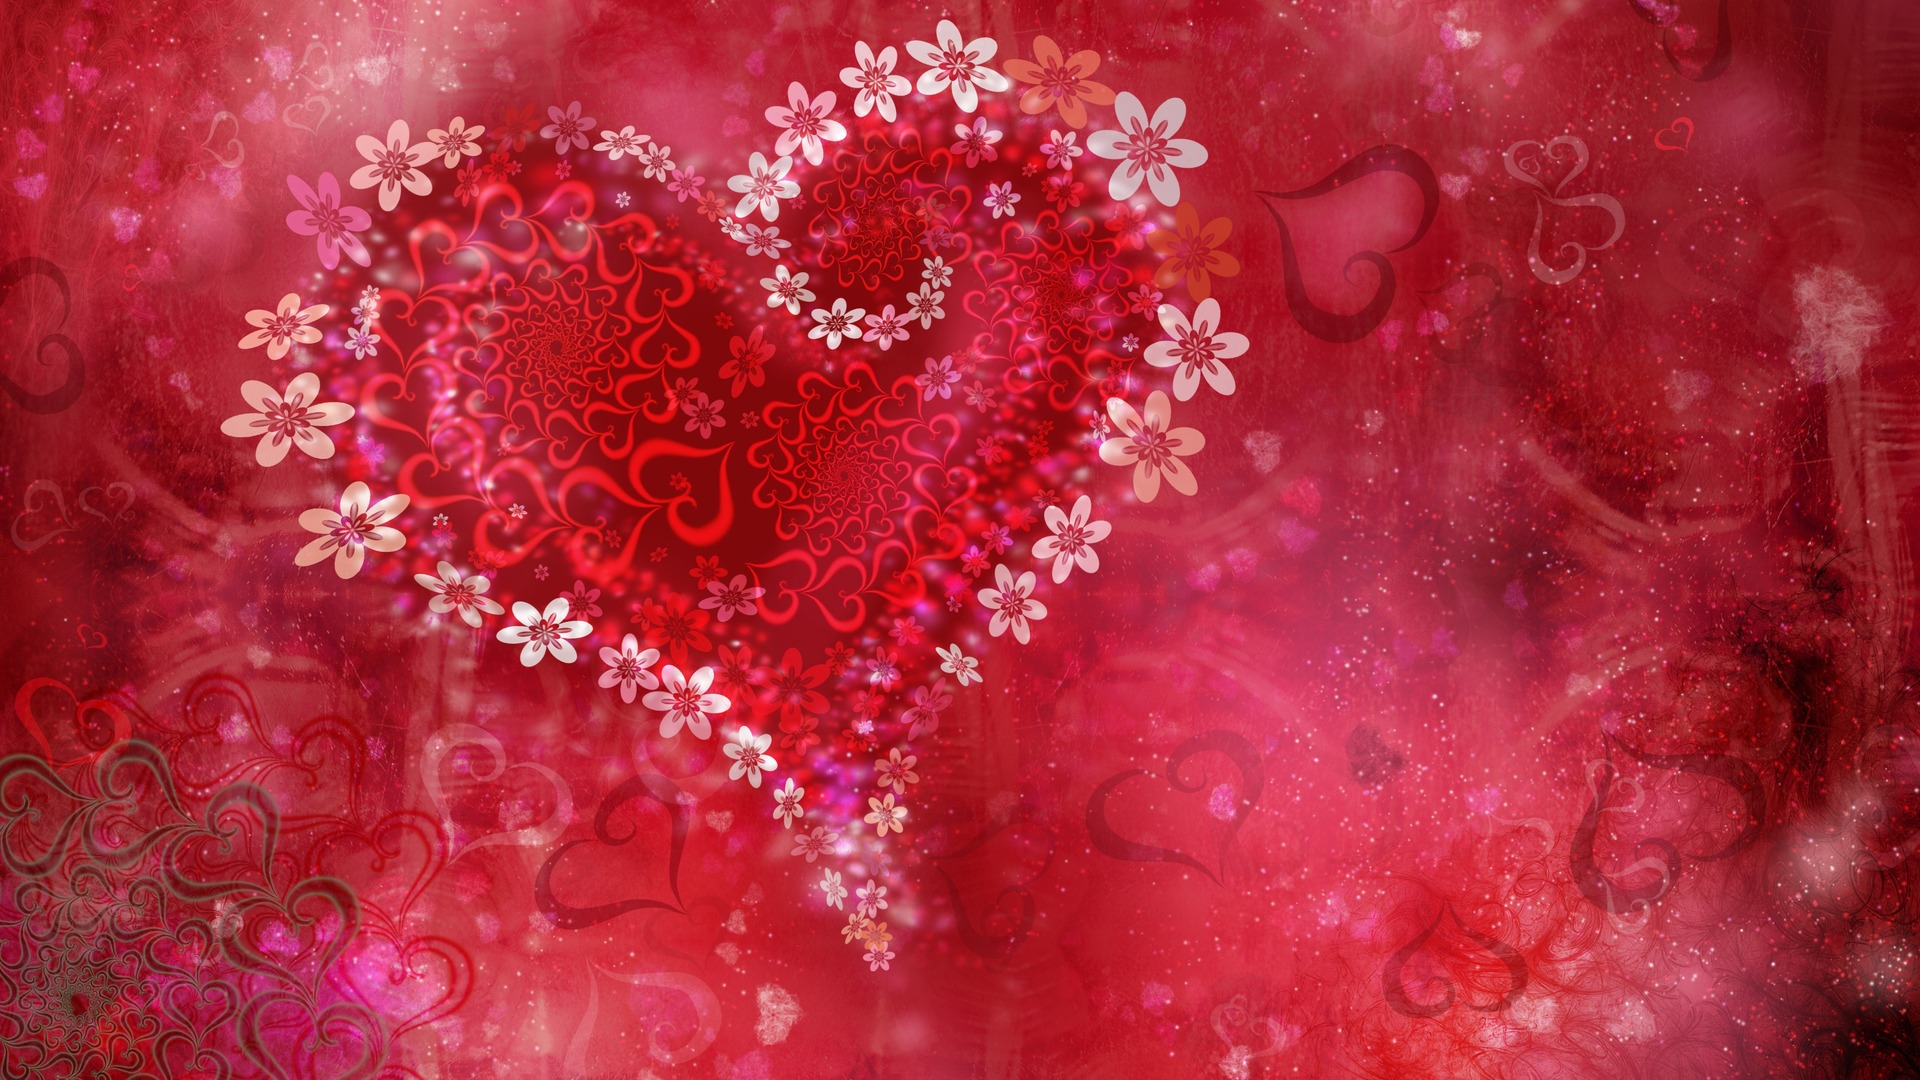 Love Heart Flowers HD Wallpaper Love Valentine Wallpapers 1920x1080